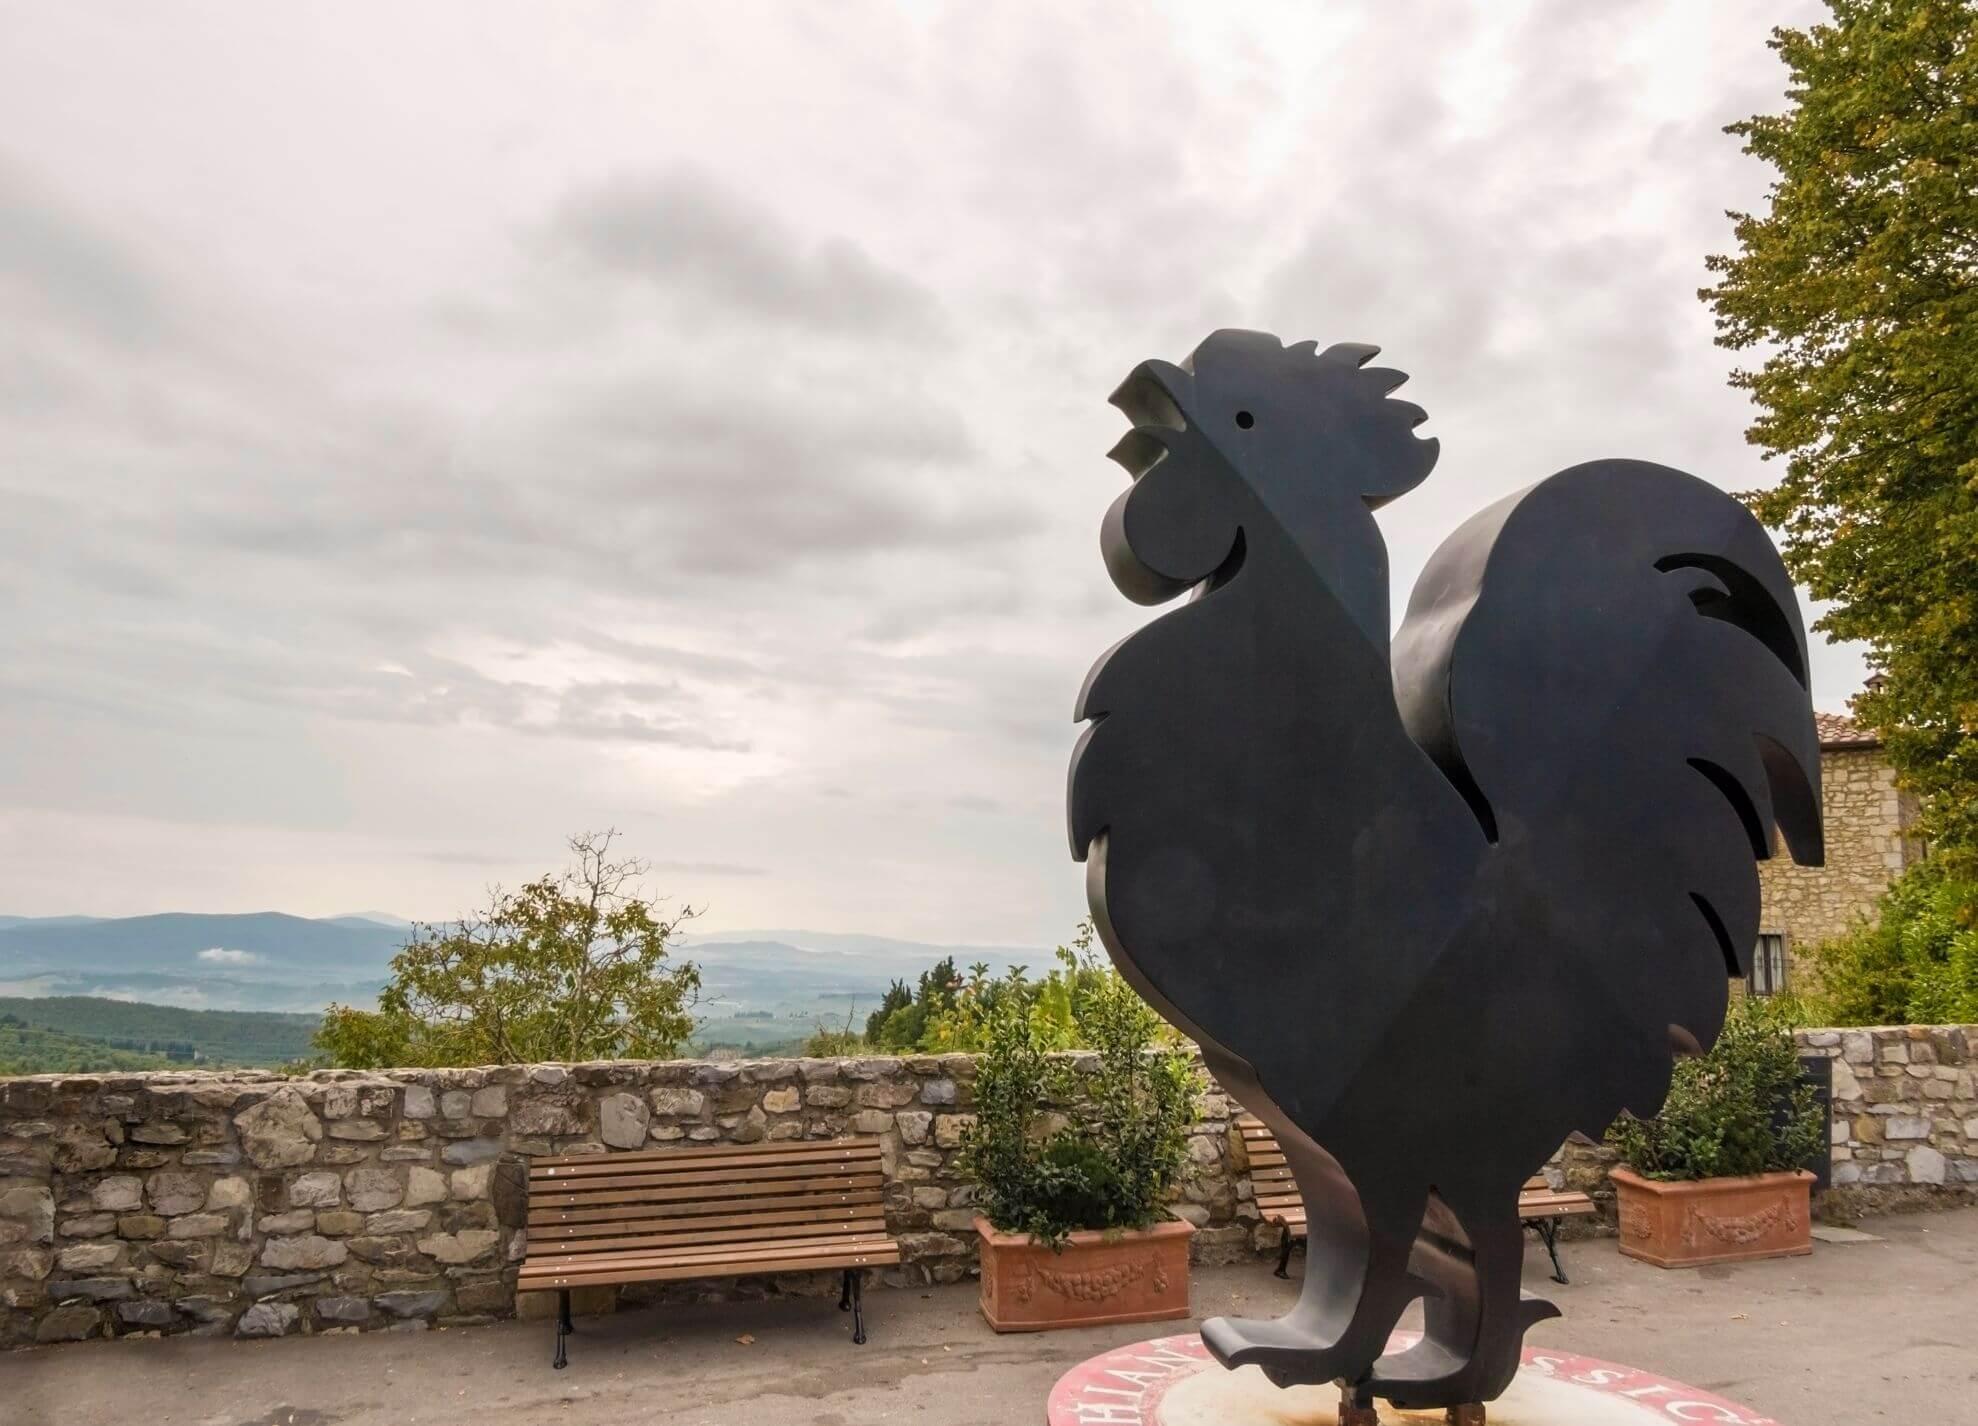 07-VisitChianti-Castellina-in-Chianti-shutterstock_1523711018-1978x1426